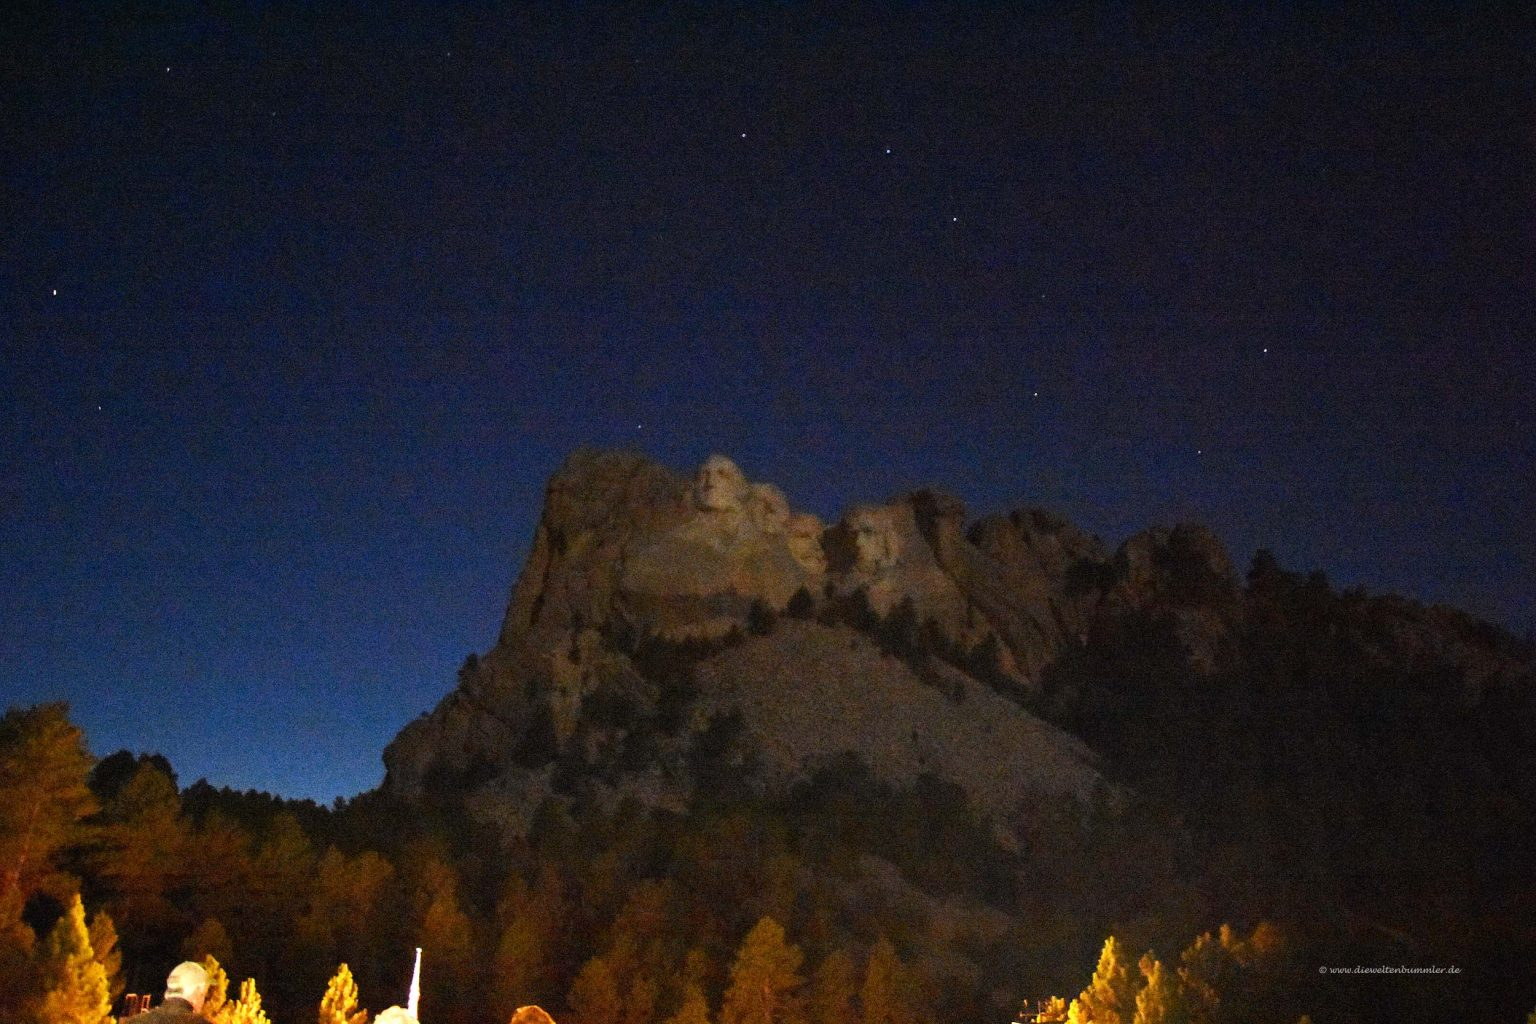 Mount Rushmore am Abend